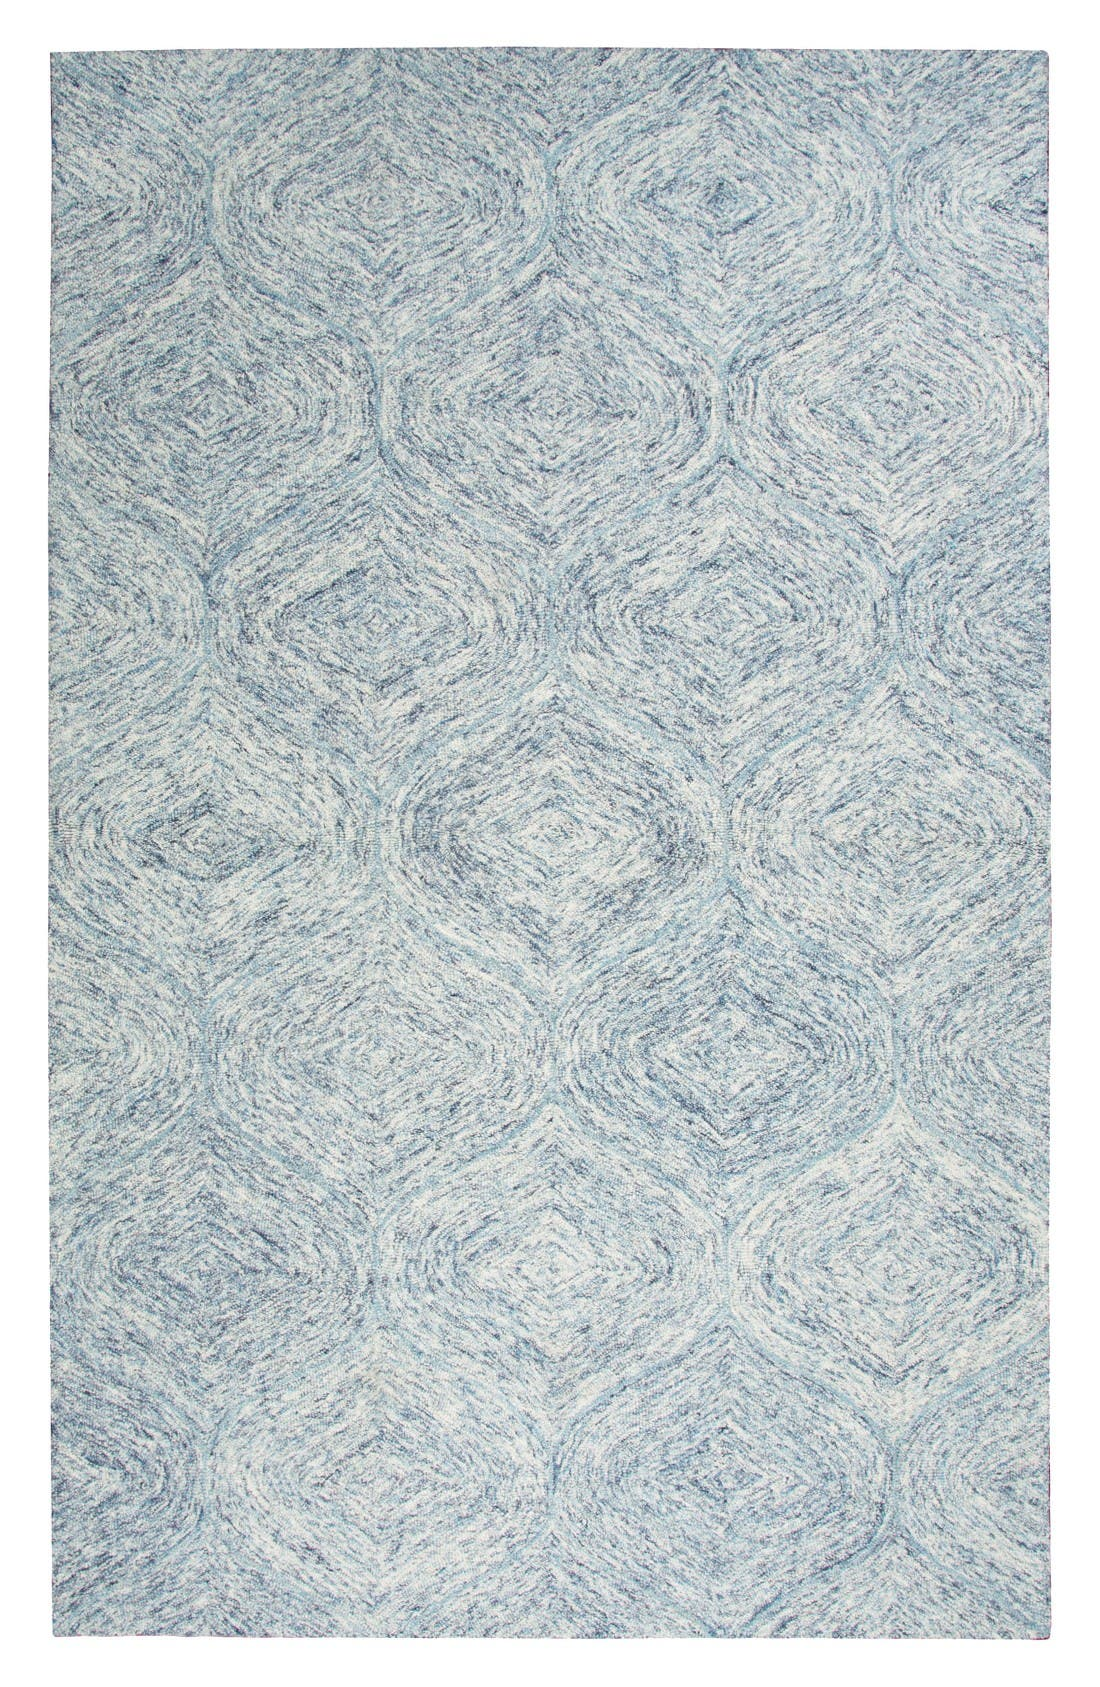 Main Image - Rizzy Home Irregular Diamond Hand Tufted Wool Area Rug